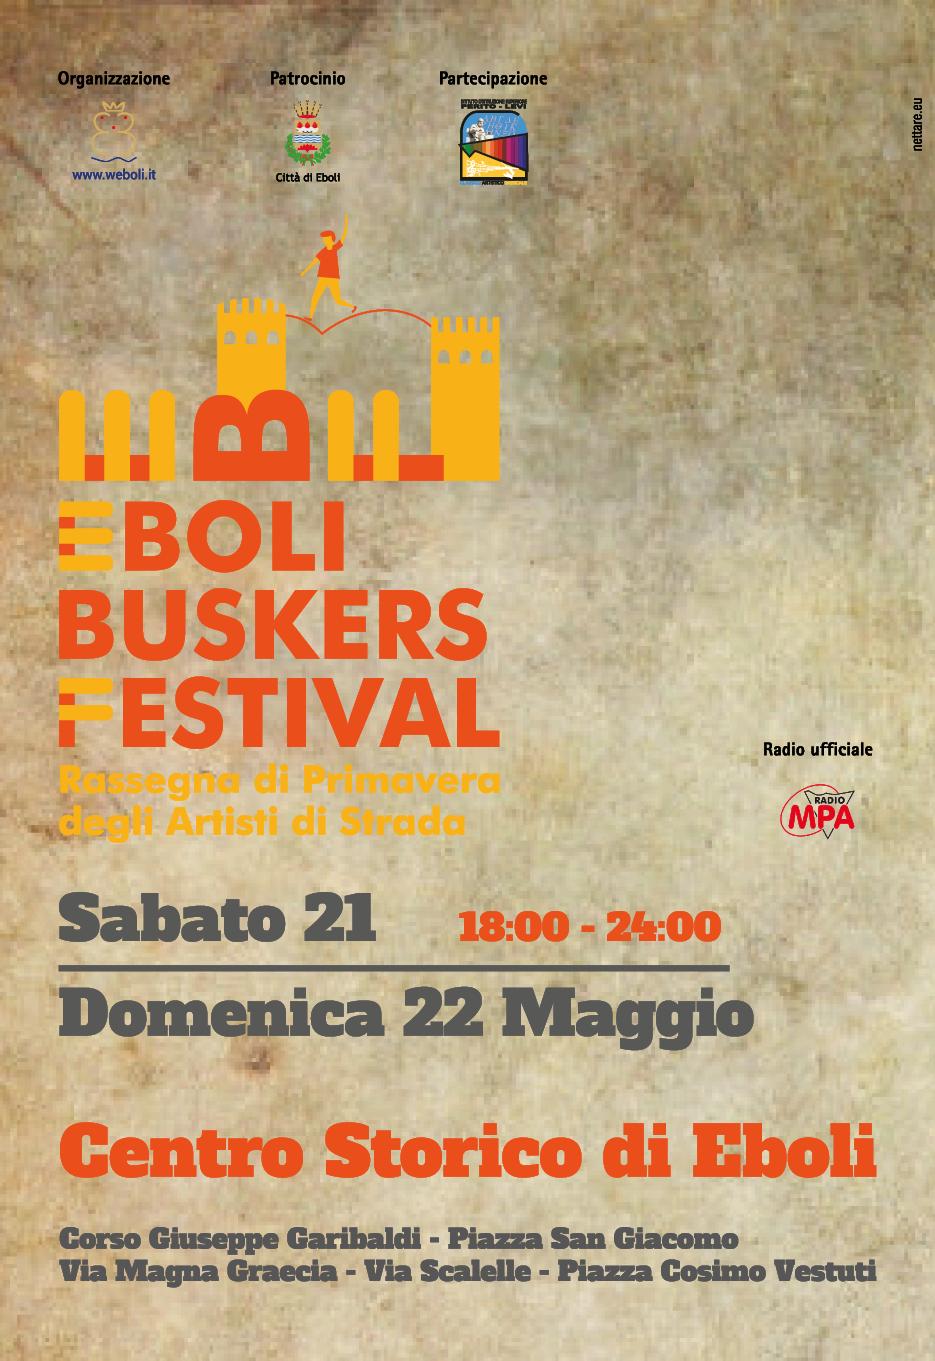 Eboli Busker Festival